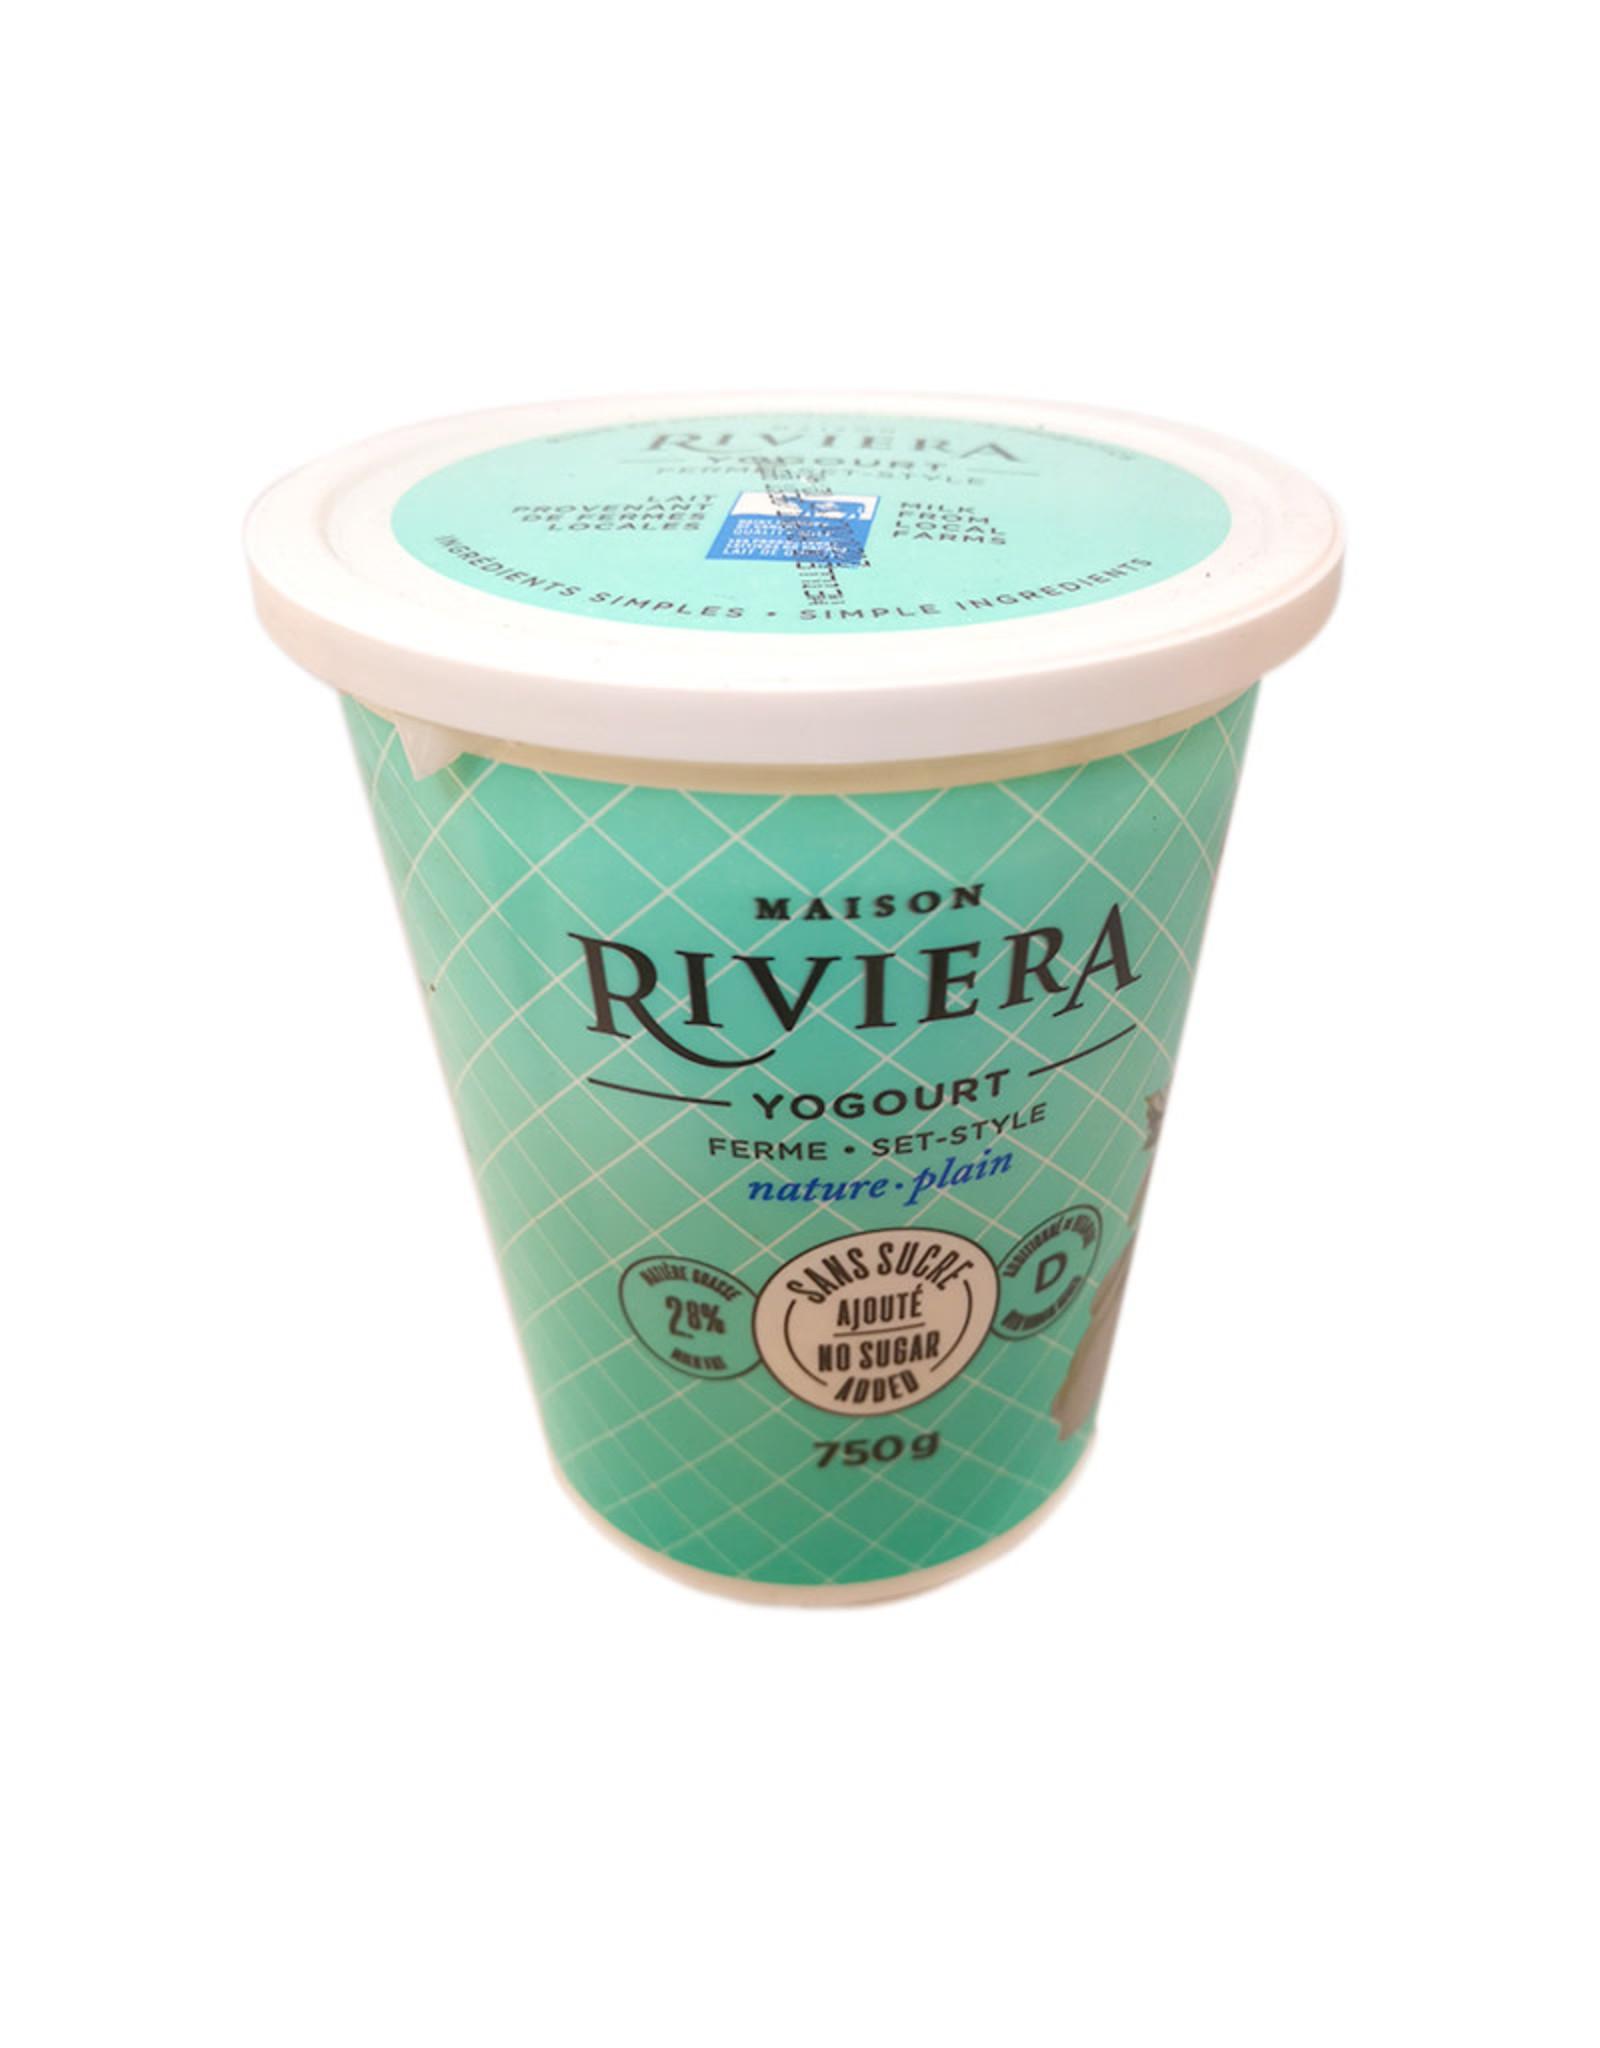 Maison Riveria Maison Riviera - Yogurt, Plain 2.8%  (750g)